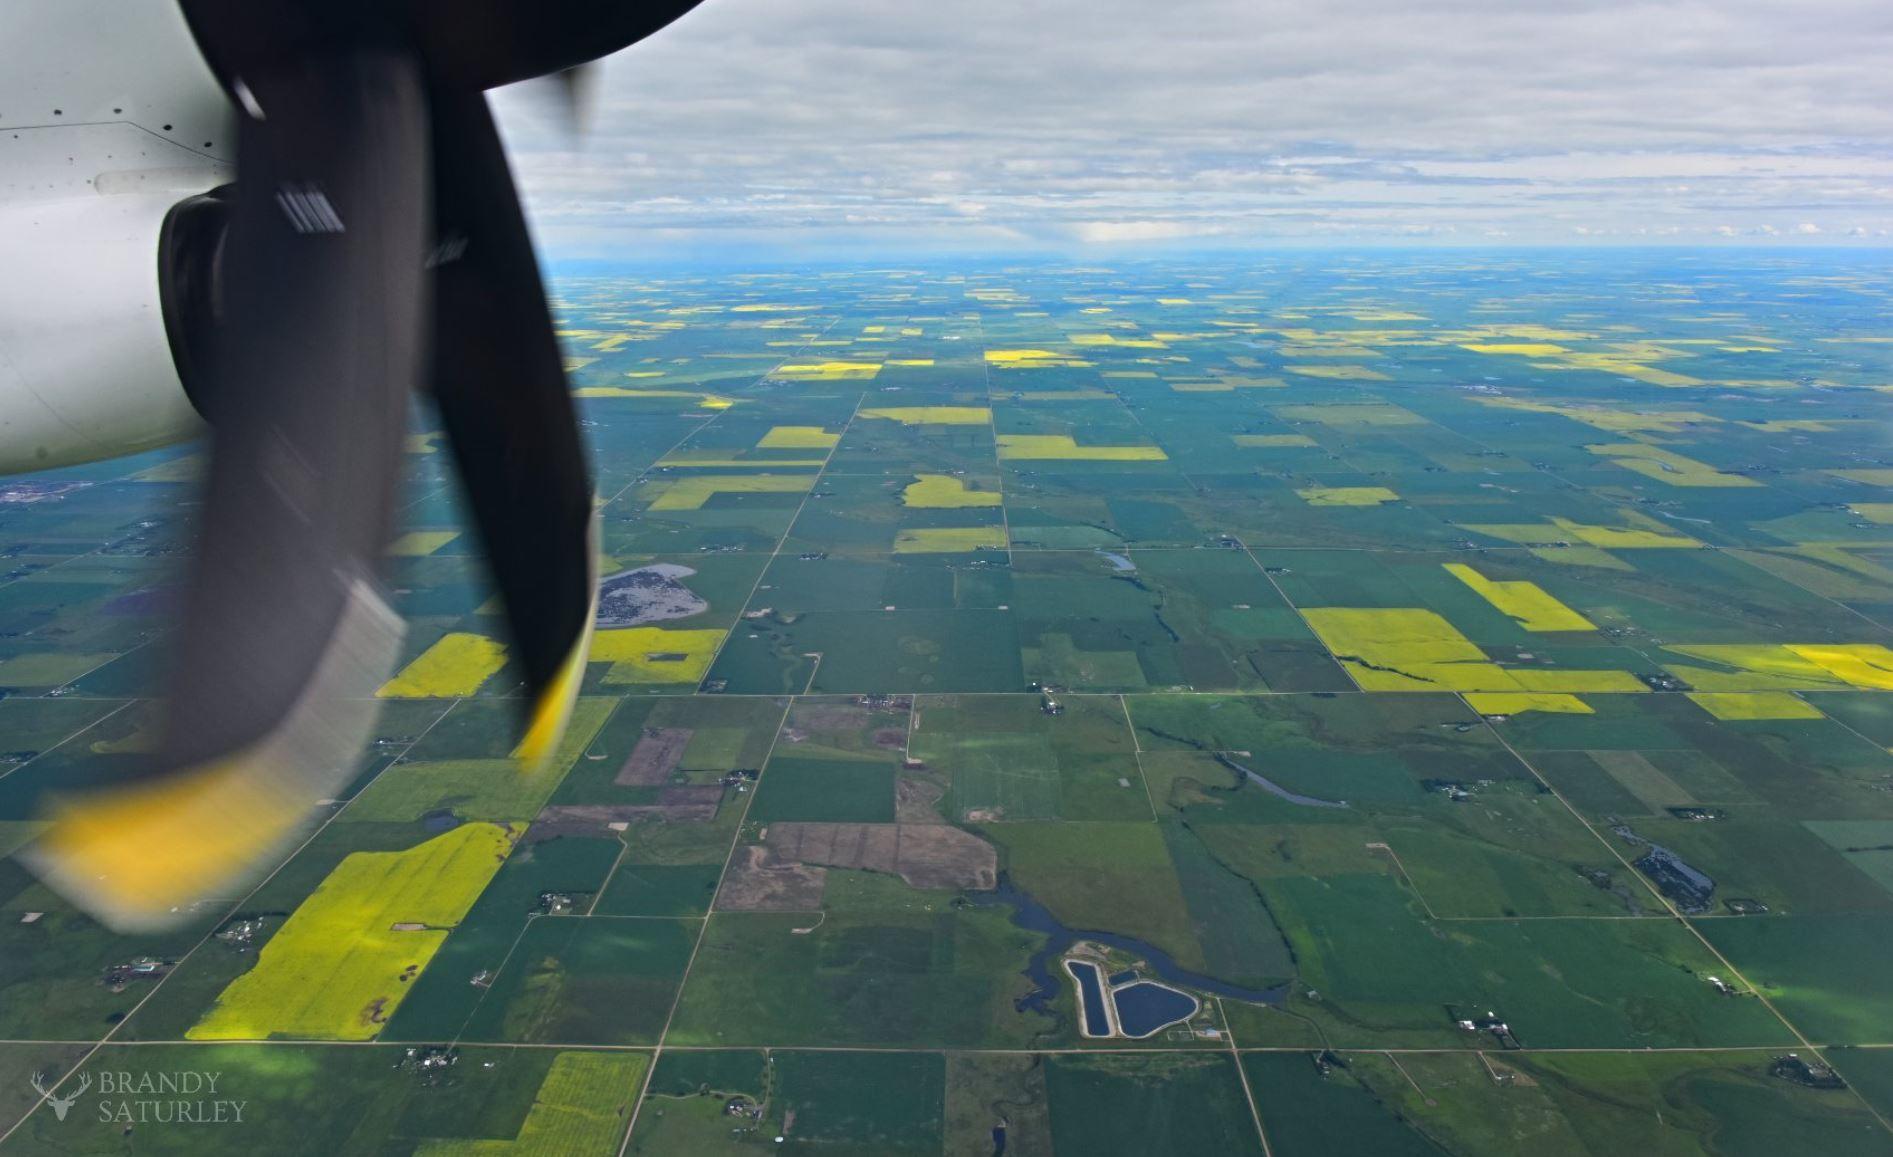 westjet flight over prairie fields of canola